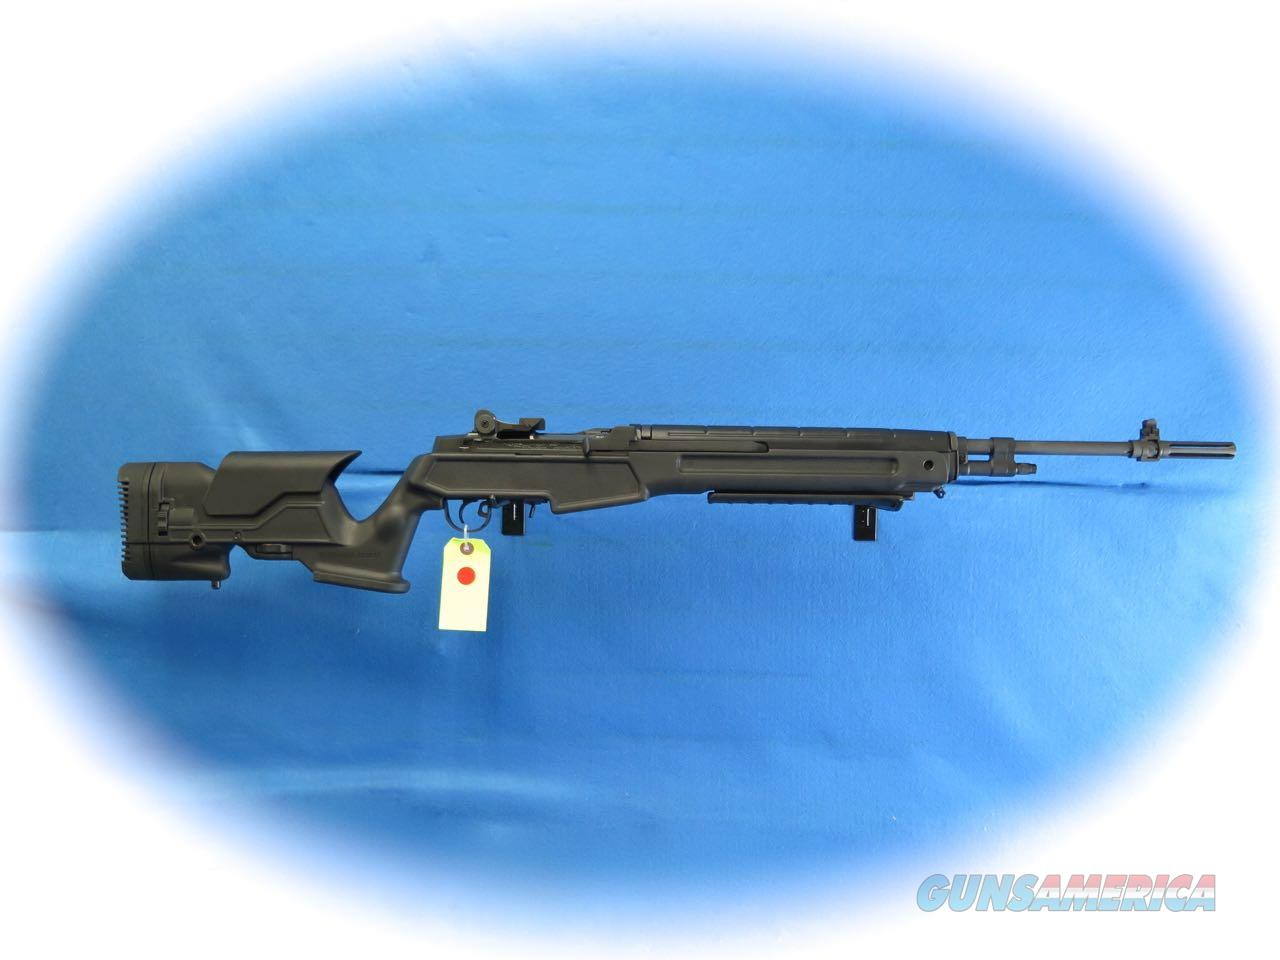 Springfield Armory M1A Loaded w/Precision Stock .308 Win Cal **New**  Guns > Rifles > Springfield Armory Rifles > M1A/M14